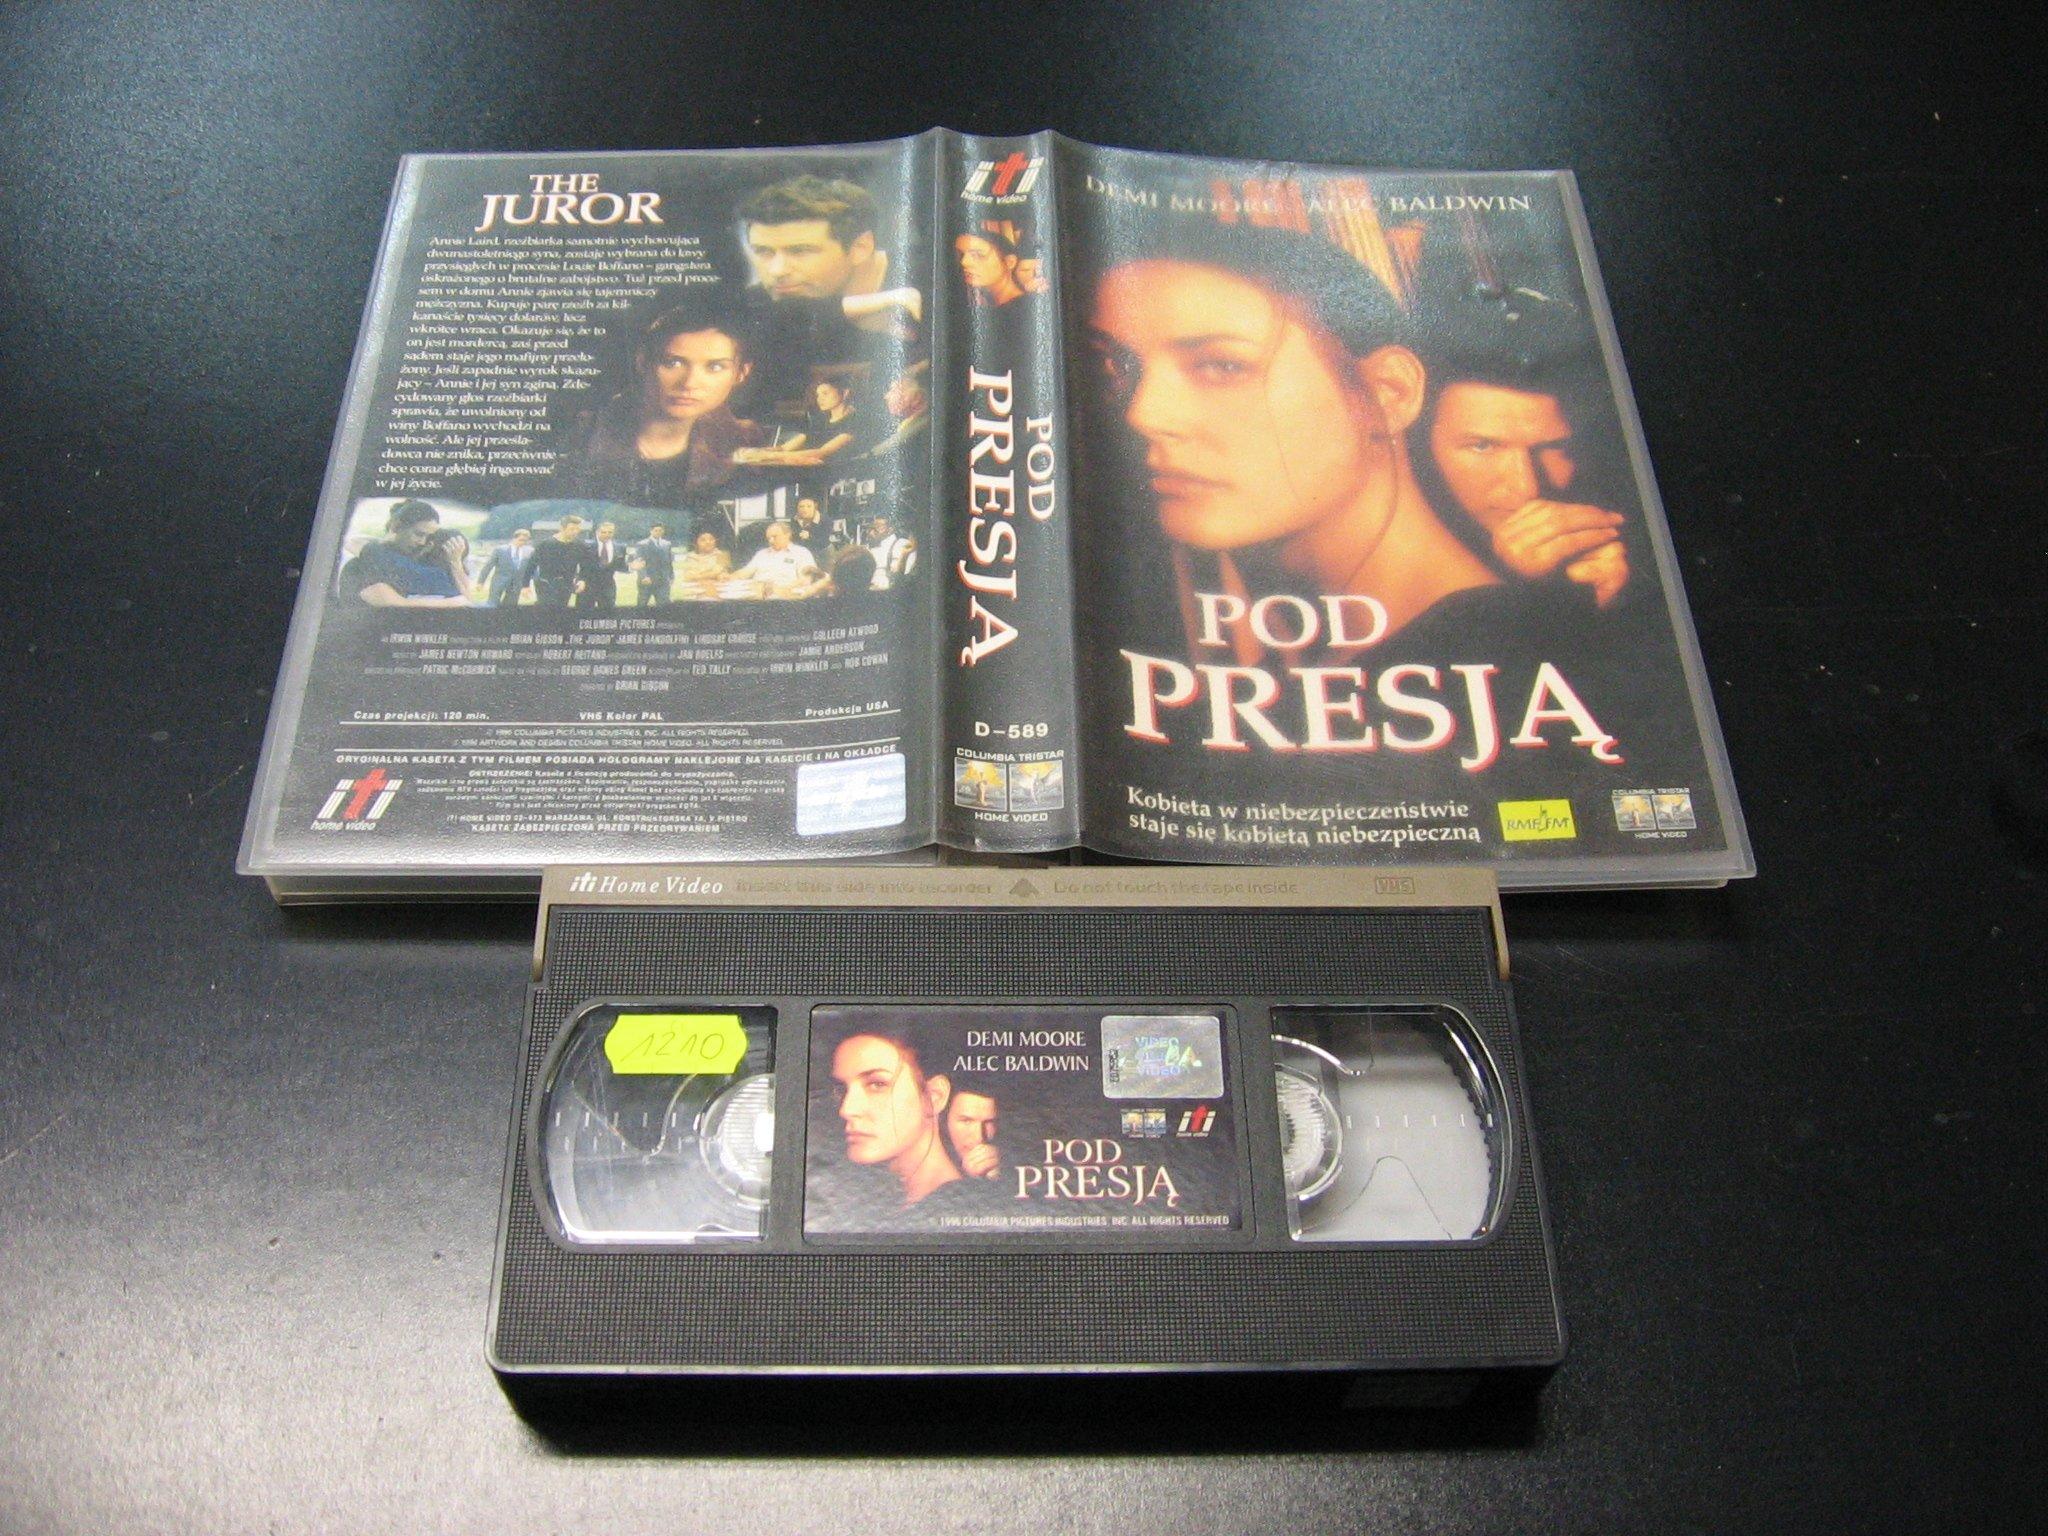 POD PRESJĄ -  kaseta VHS - 0989 Opole - AlleOpole.pl